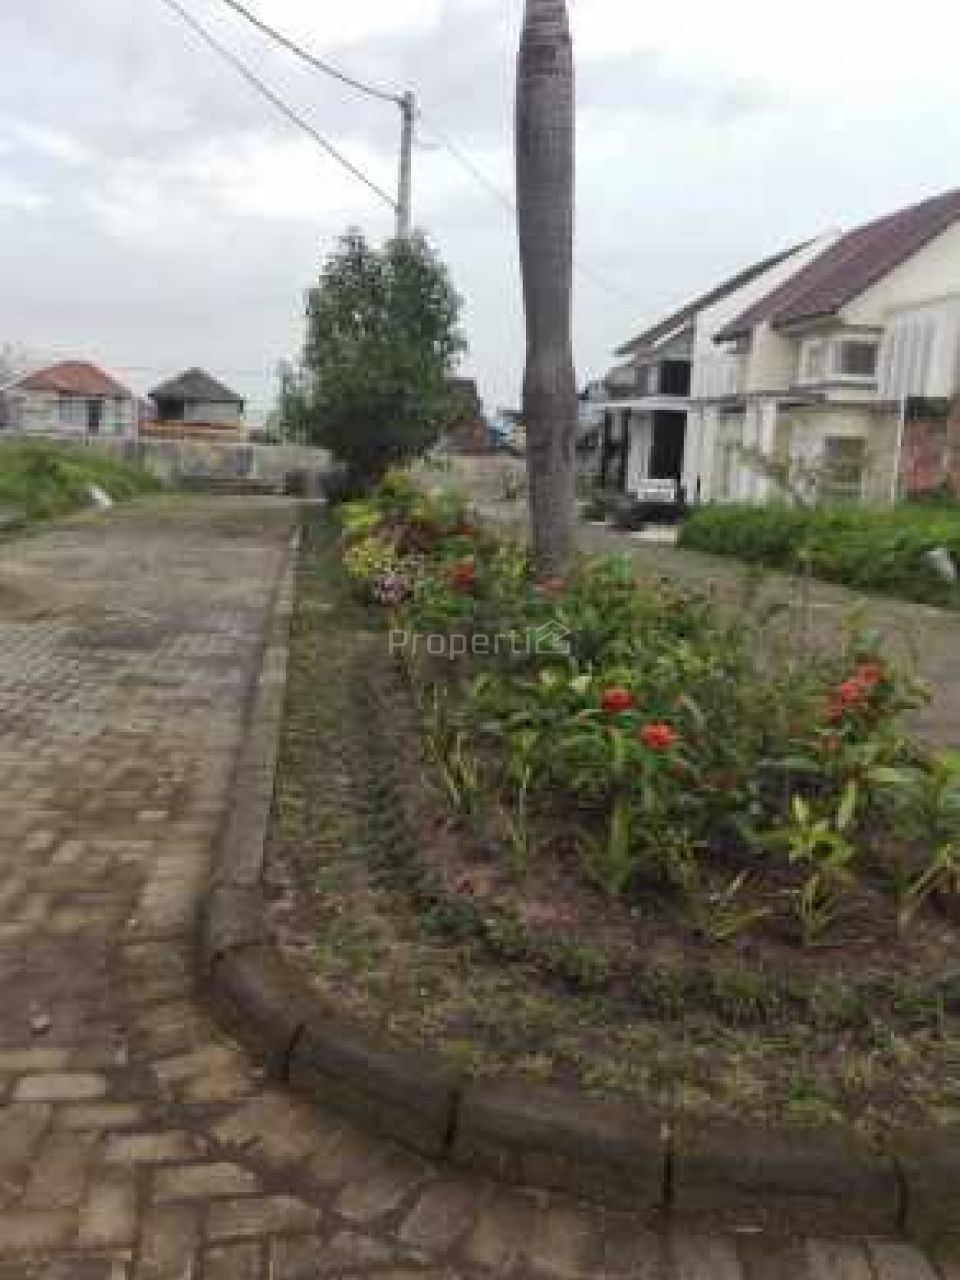 Rumah Minimalis Lingkungan Dingin di Sekitar Kawasan Wisata, Jawa Timur